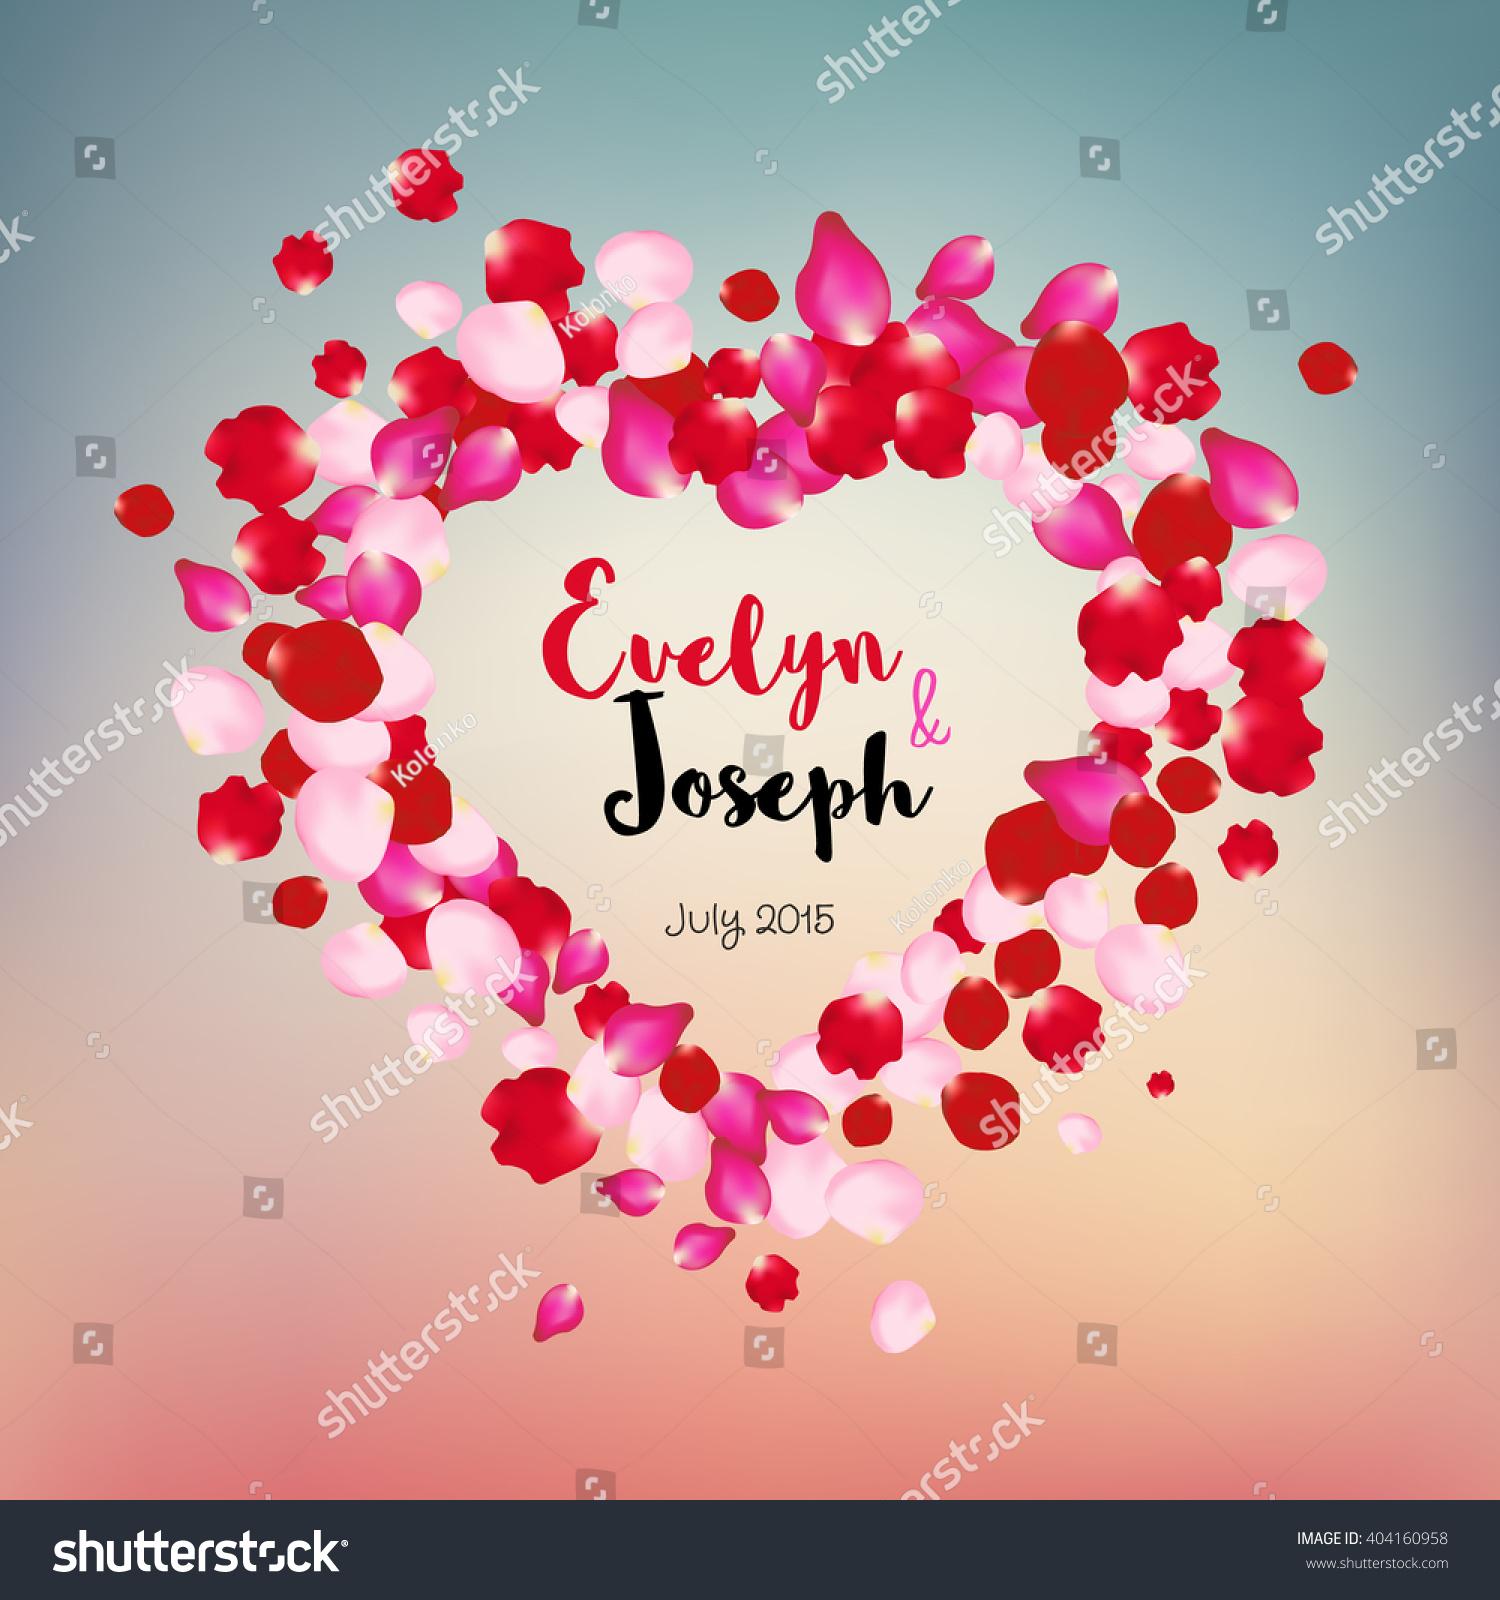 Rose Petals Heart Beautiful Wedding Invitation Stock Vector (Royalty ...